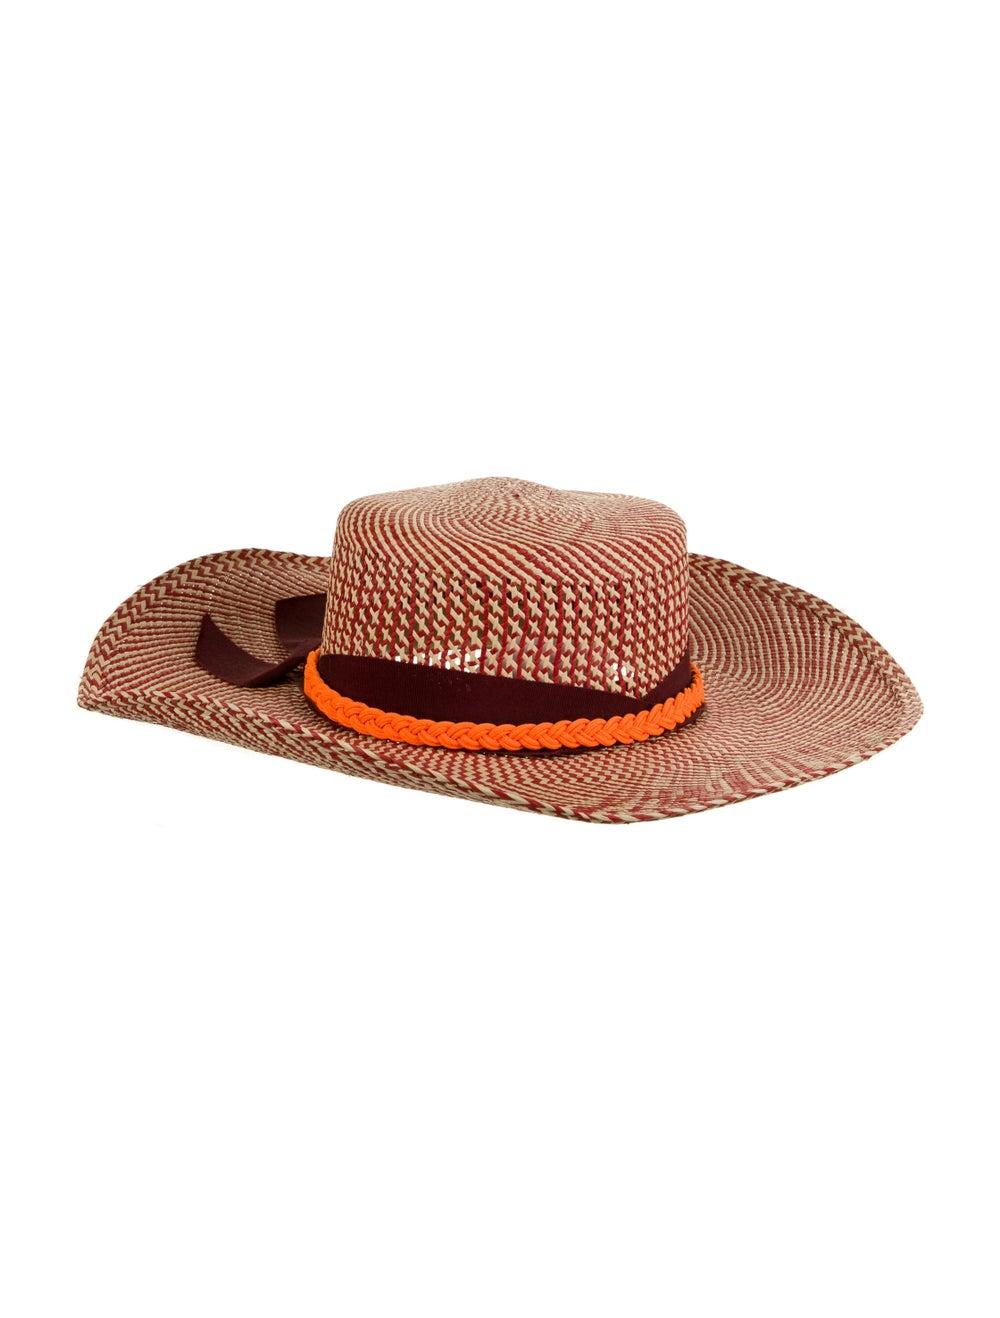 Sensi Studio Wide Brim Straw Hat Red - image 2